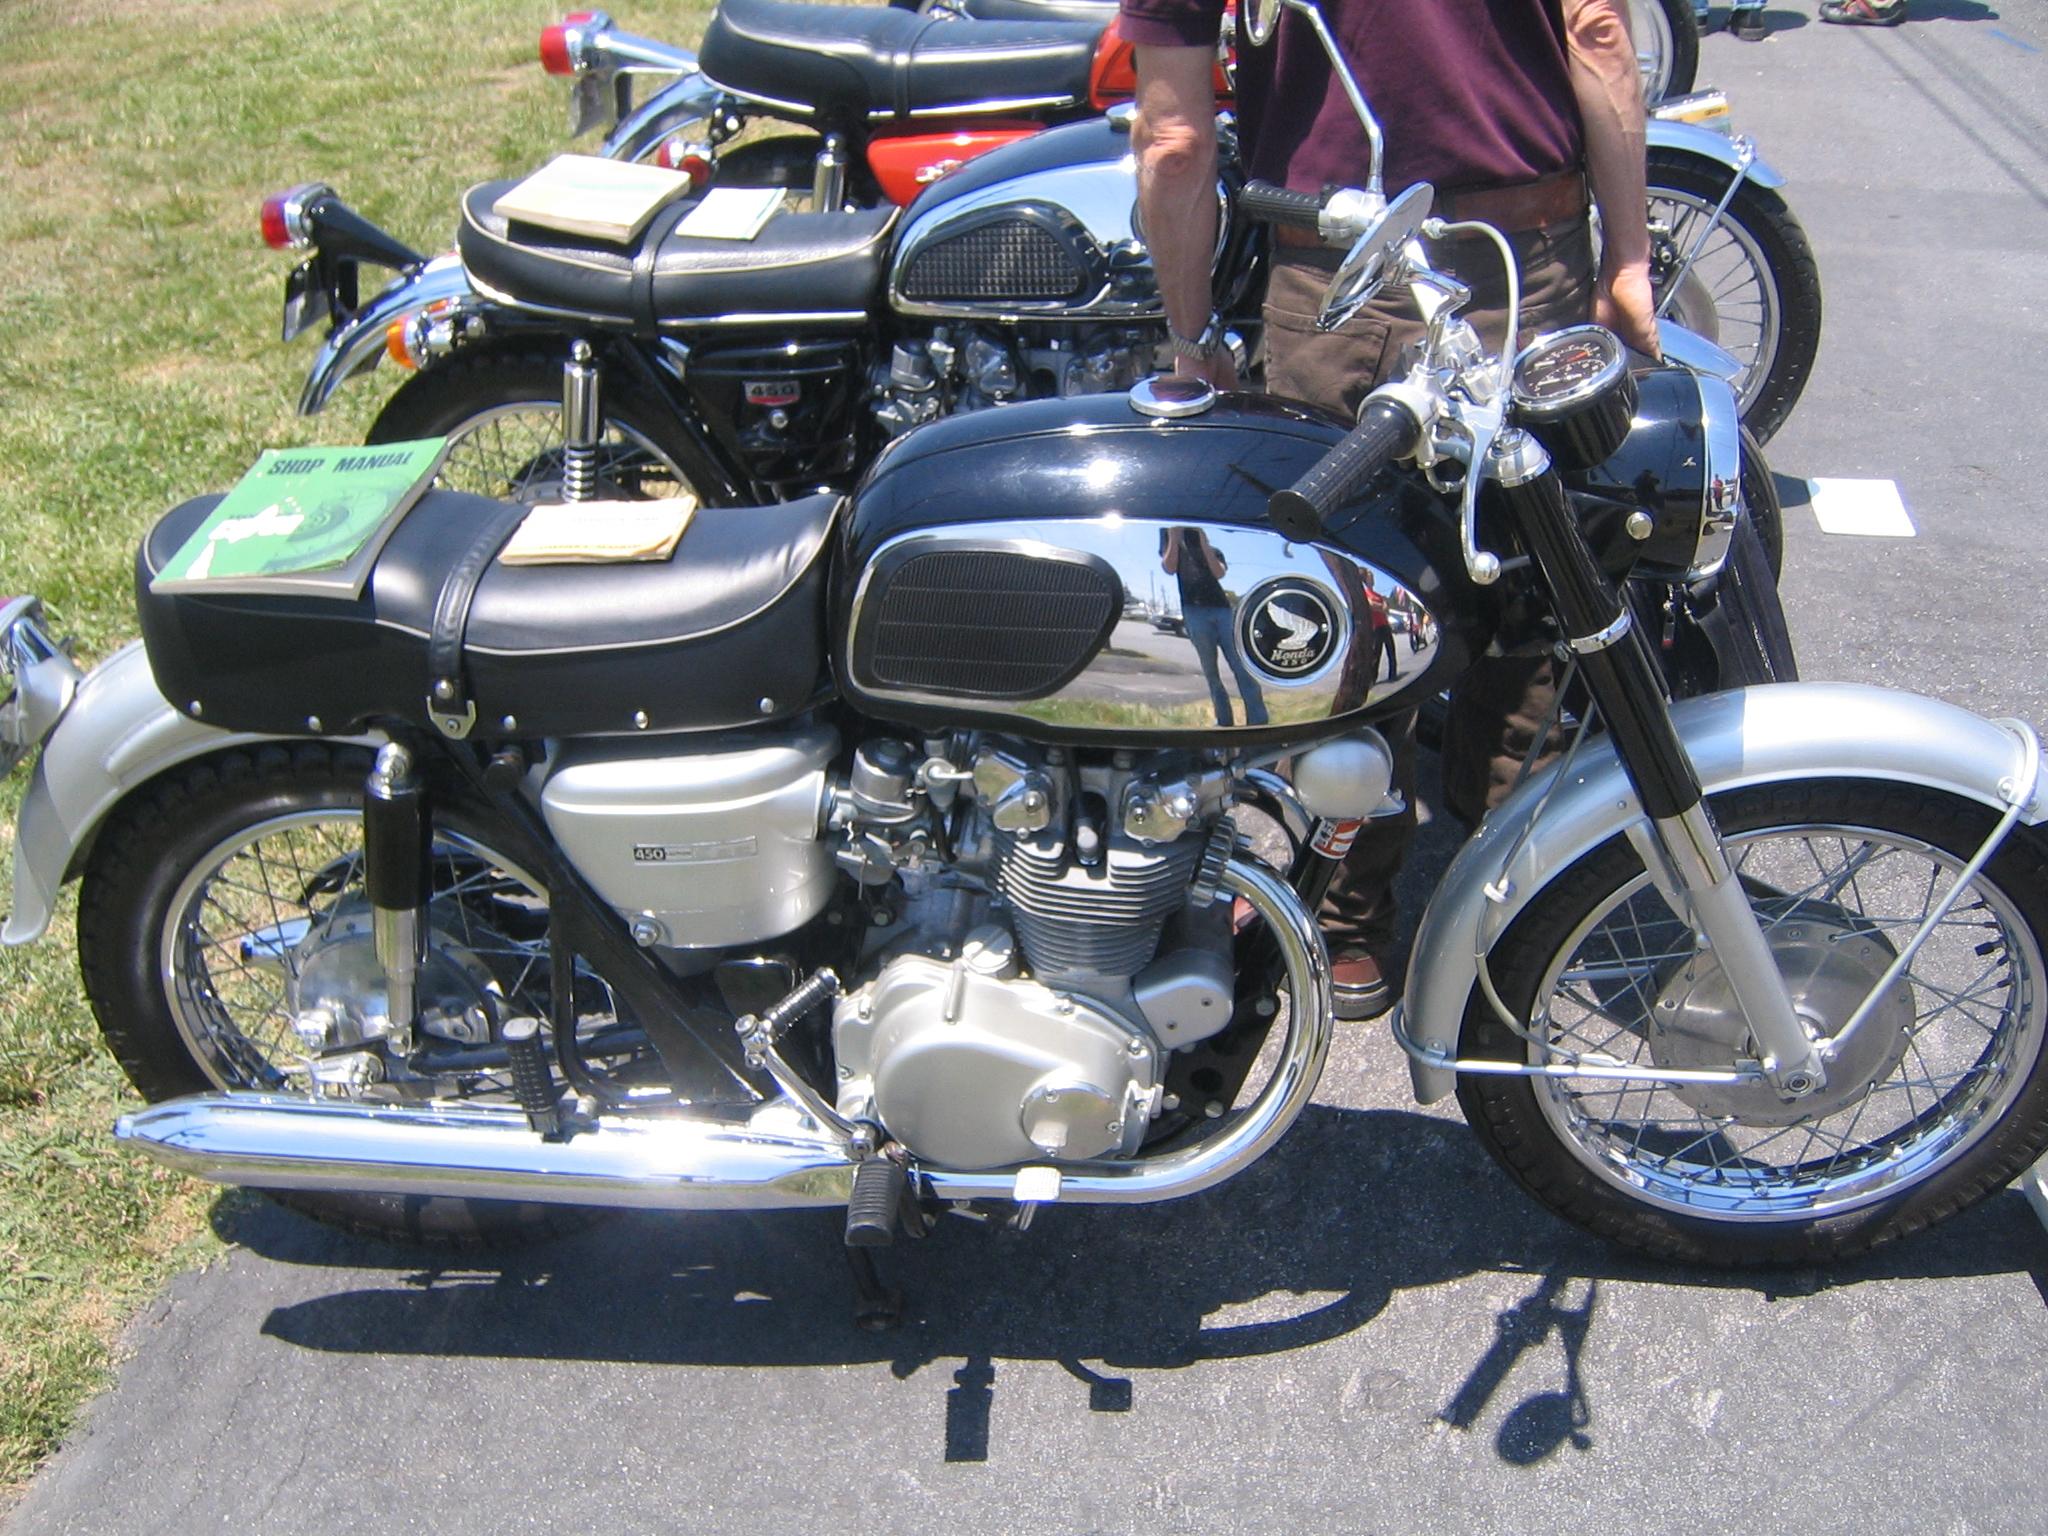 Motorcycle Oil For Kawasaki Zx